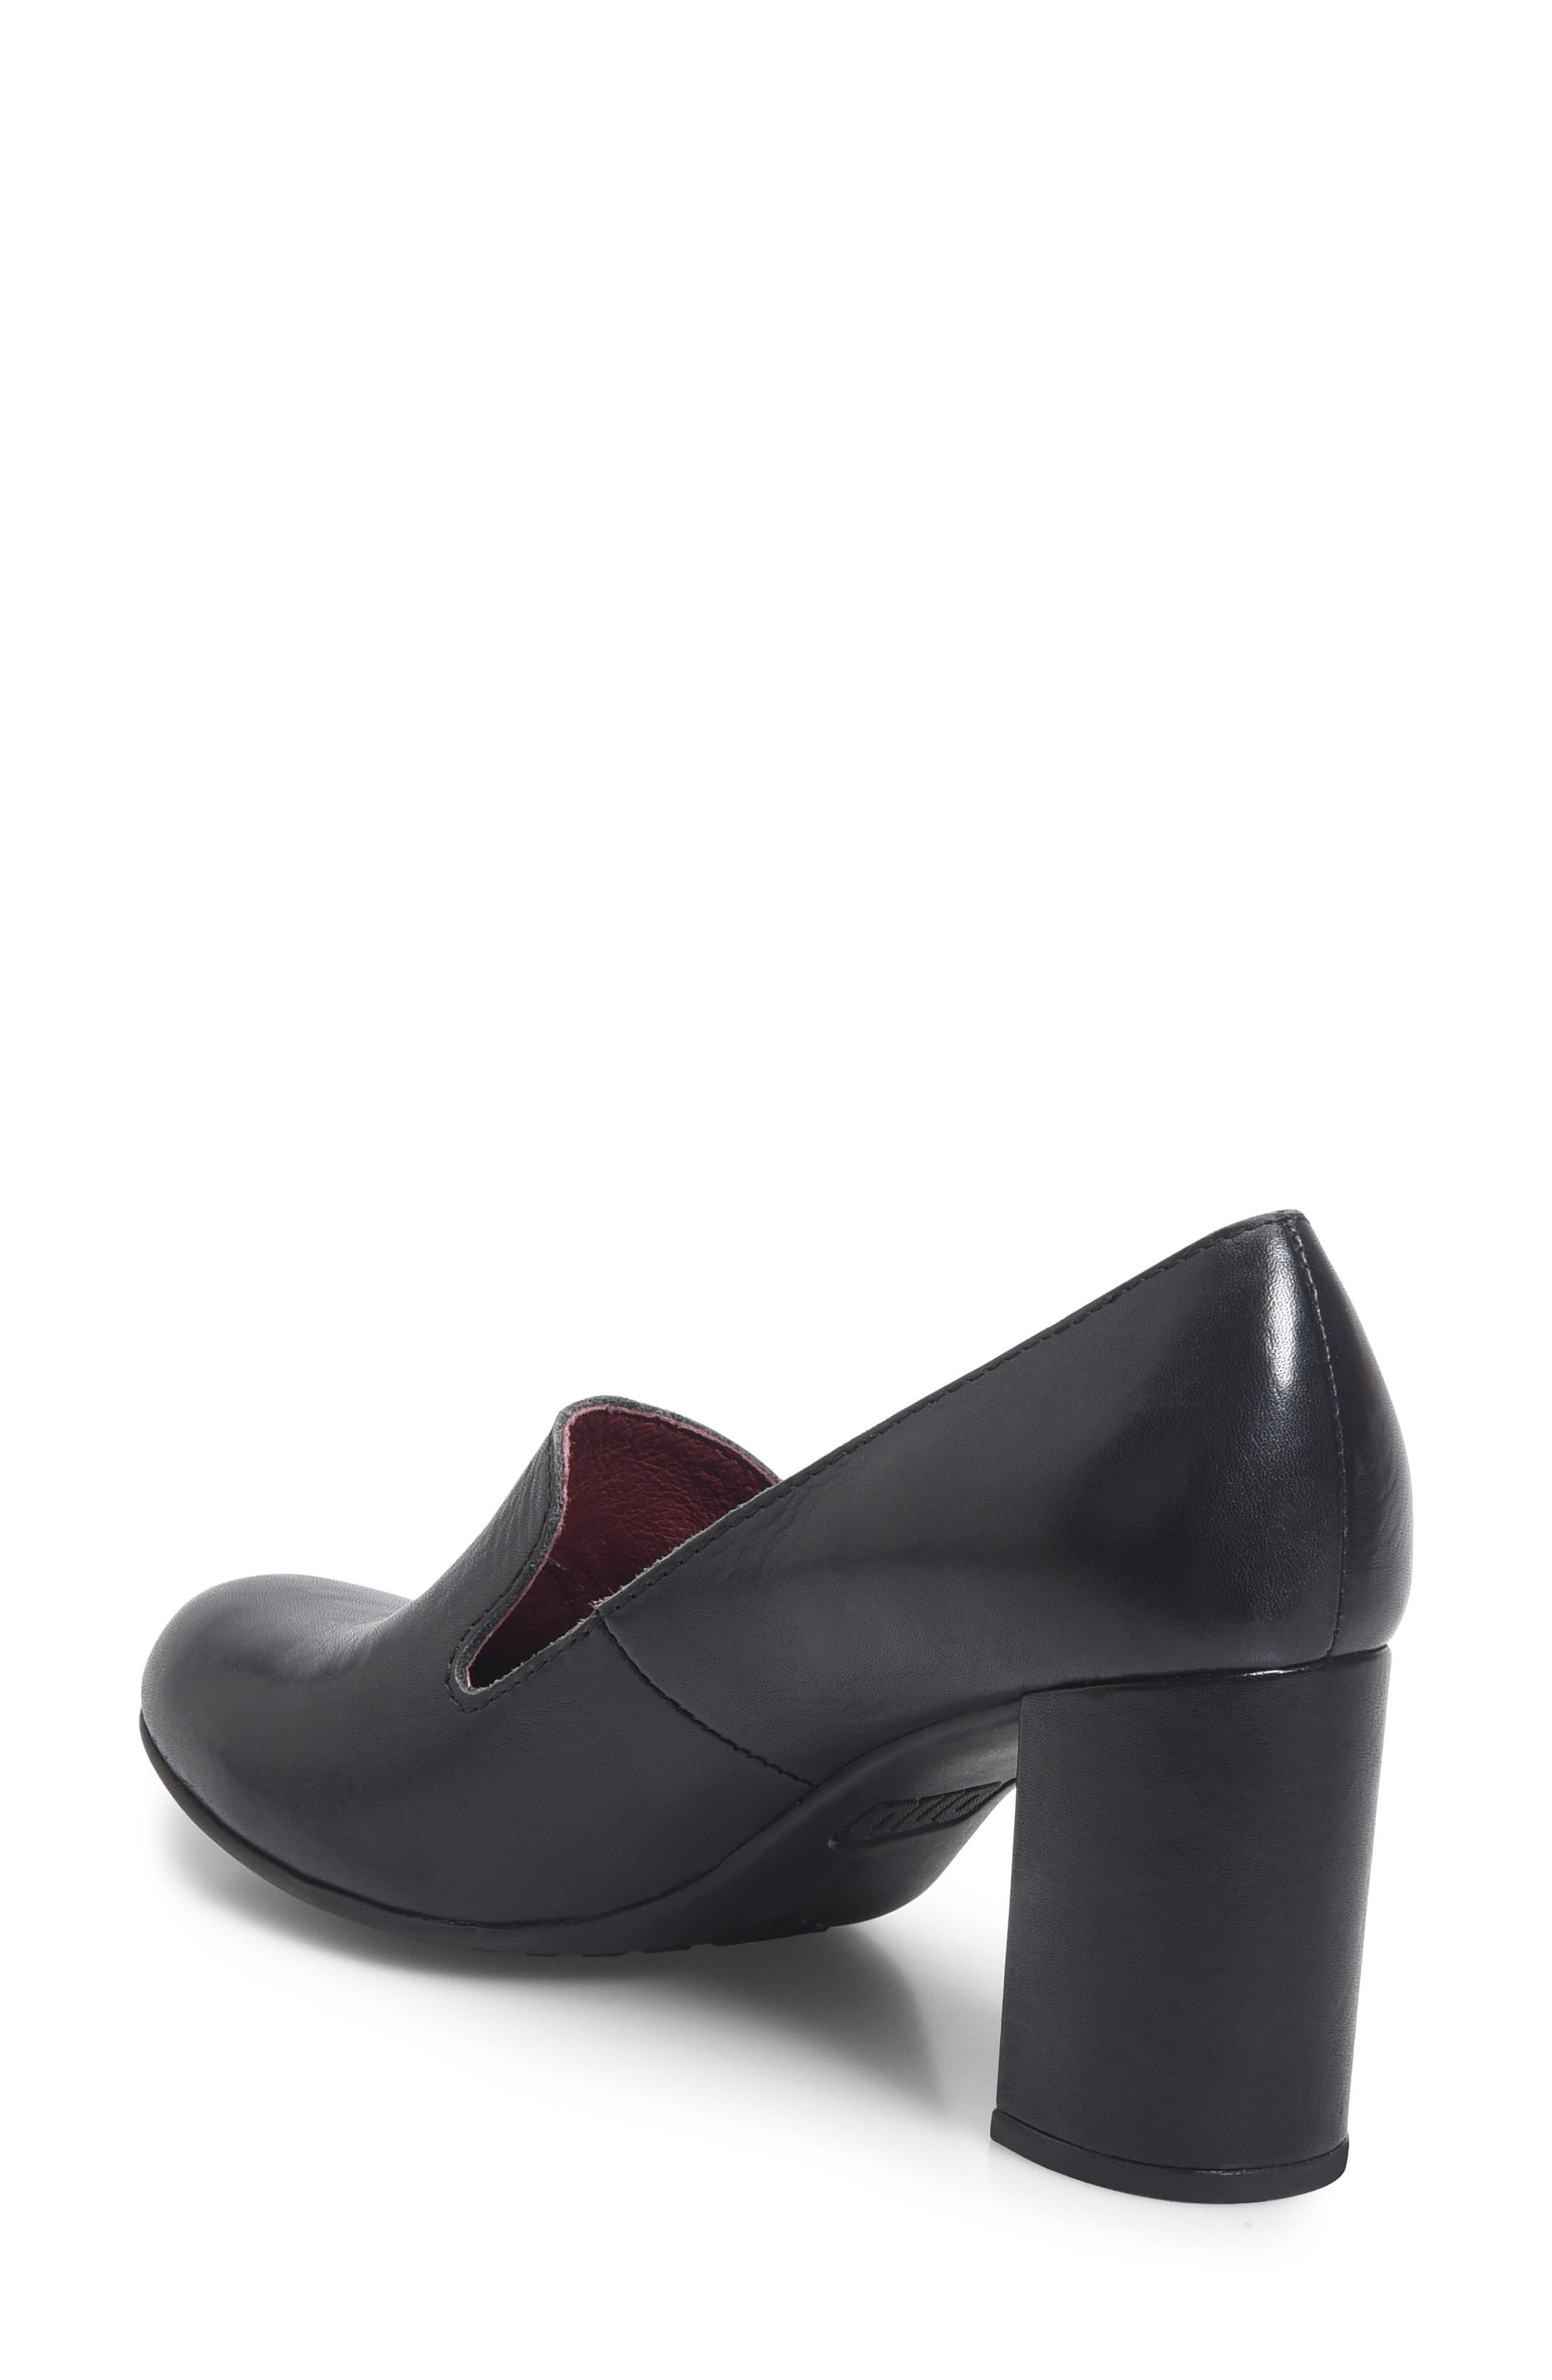 78f2553a9a4 chunky heel loafers